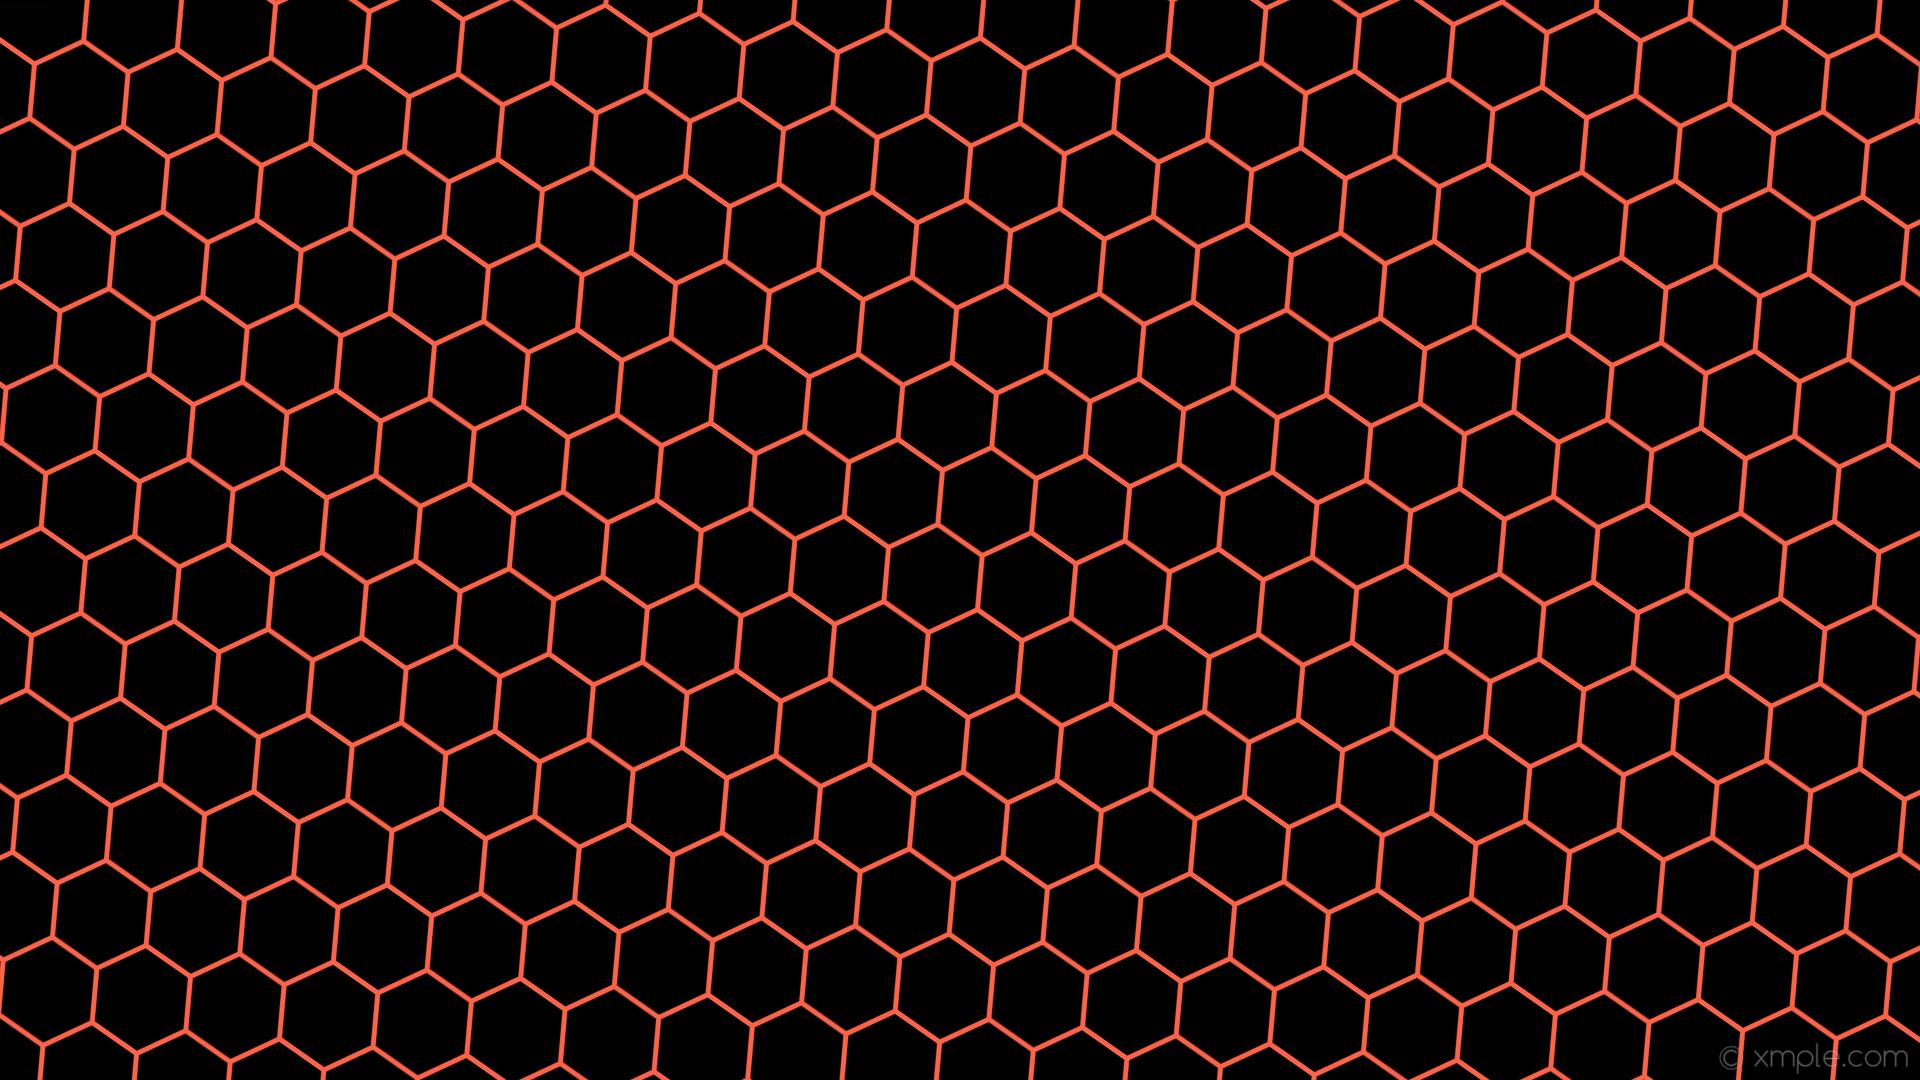 wallpaper orange honeycomb black hexagon beehive tomato #000000 #ff6347  diagonal 55° 5px 94px